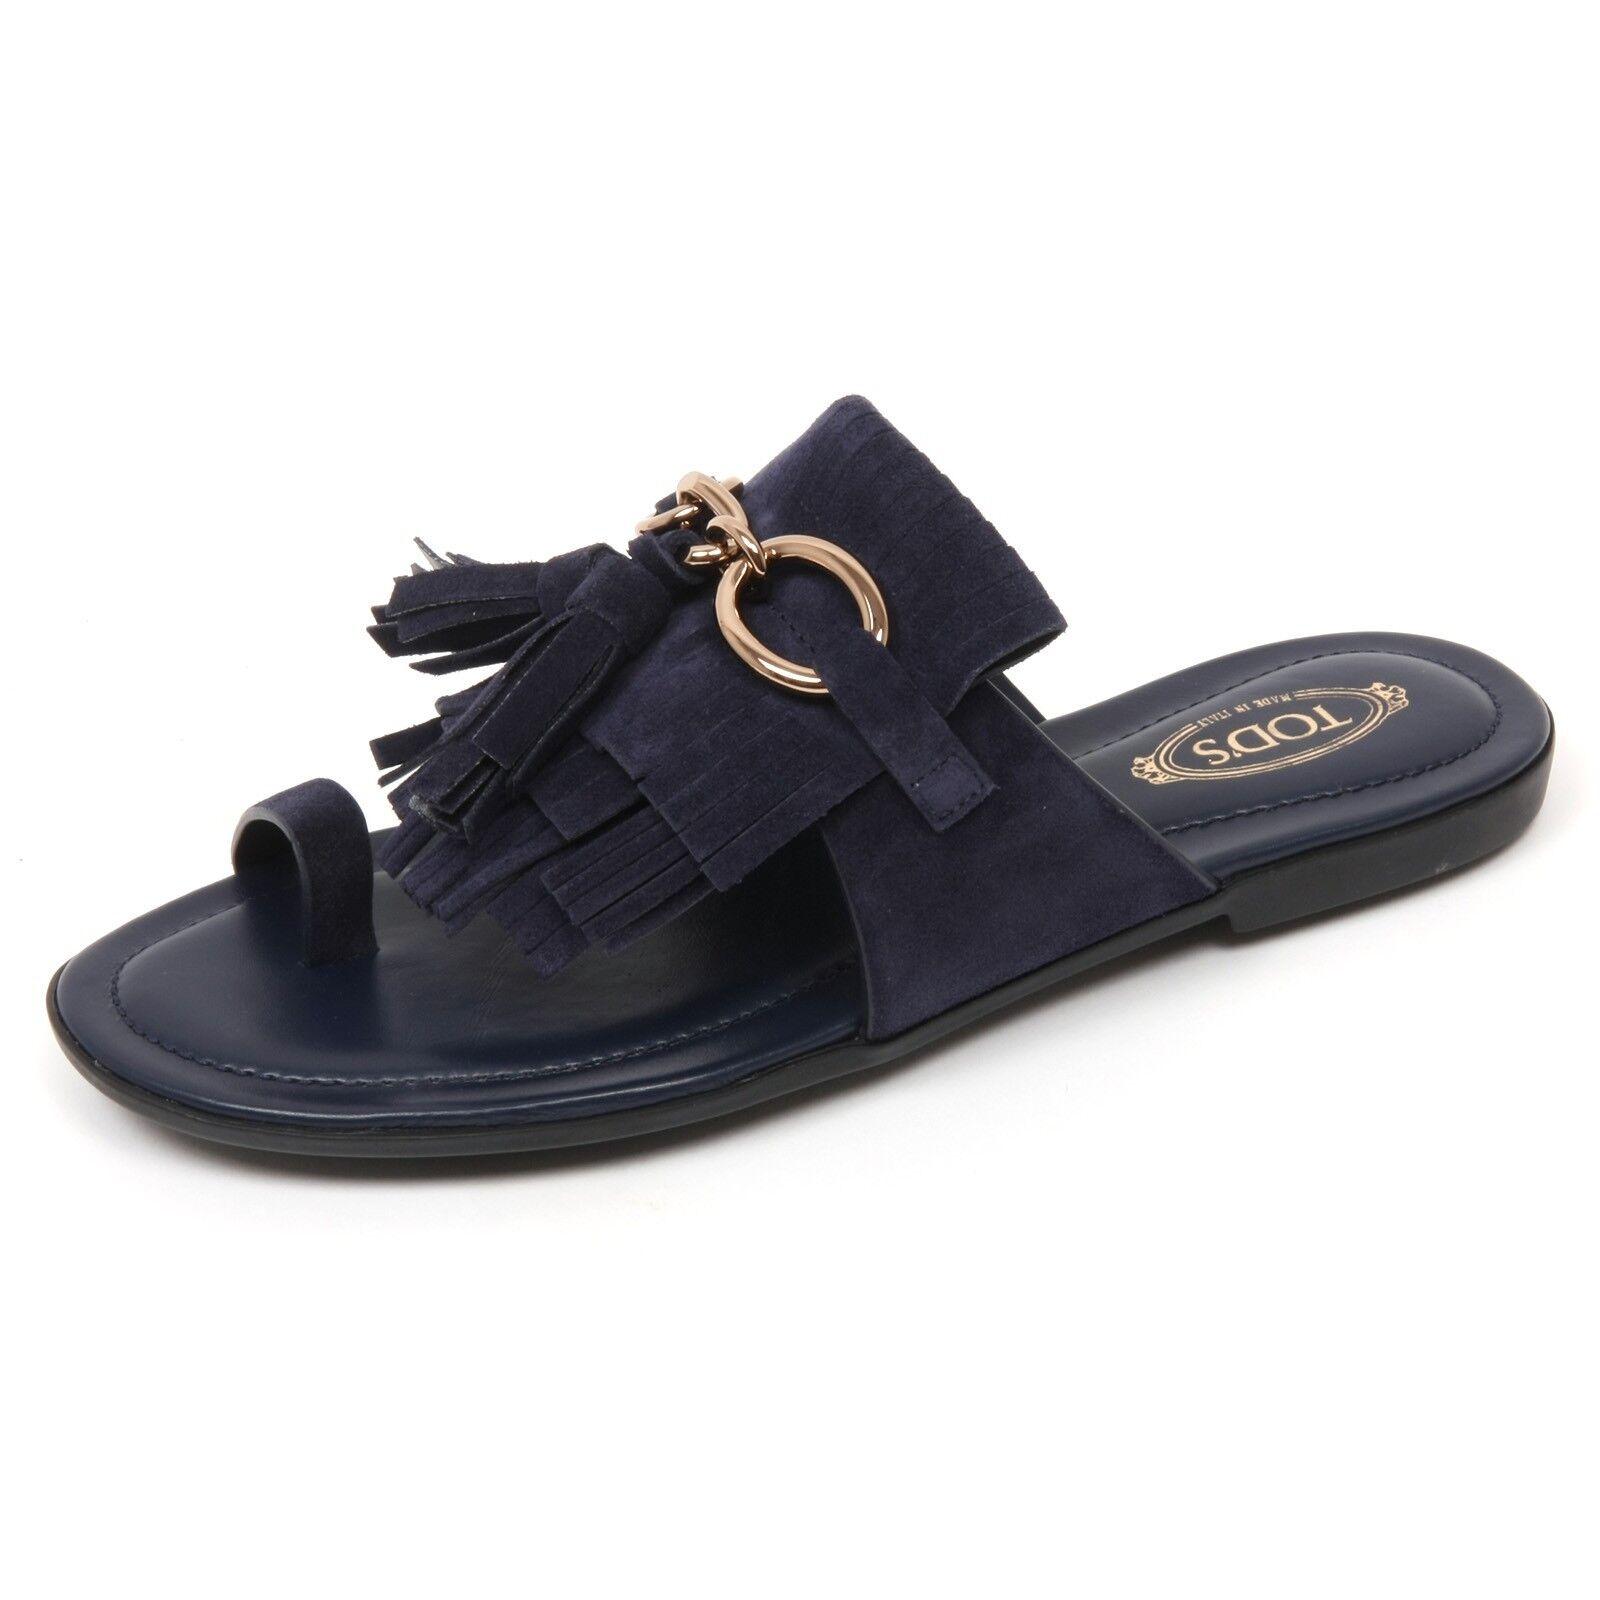 C9102 INFRADITO INFRADITO INFRADITO mujer Tod'S Scarpa Sandalo azul FRANGIA azul Zapato Mujer  los clientes primero